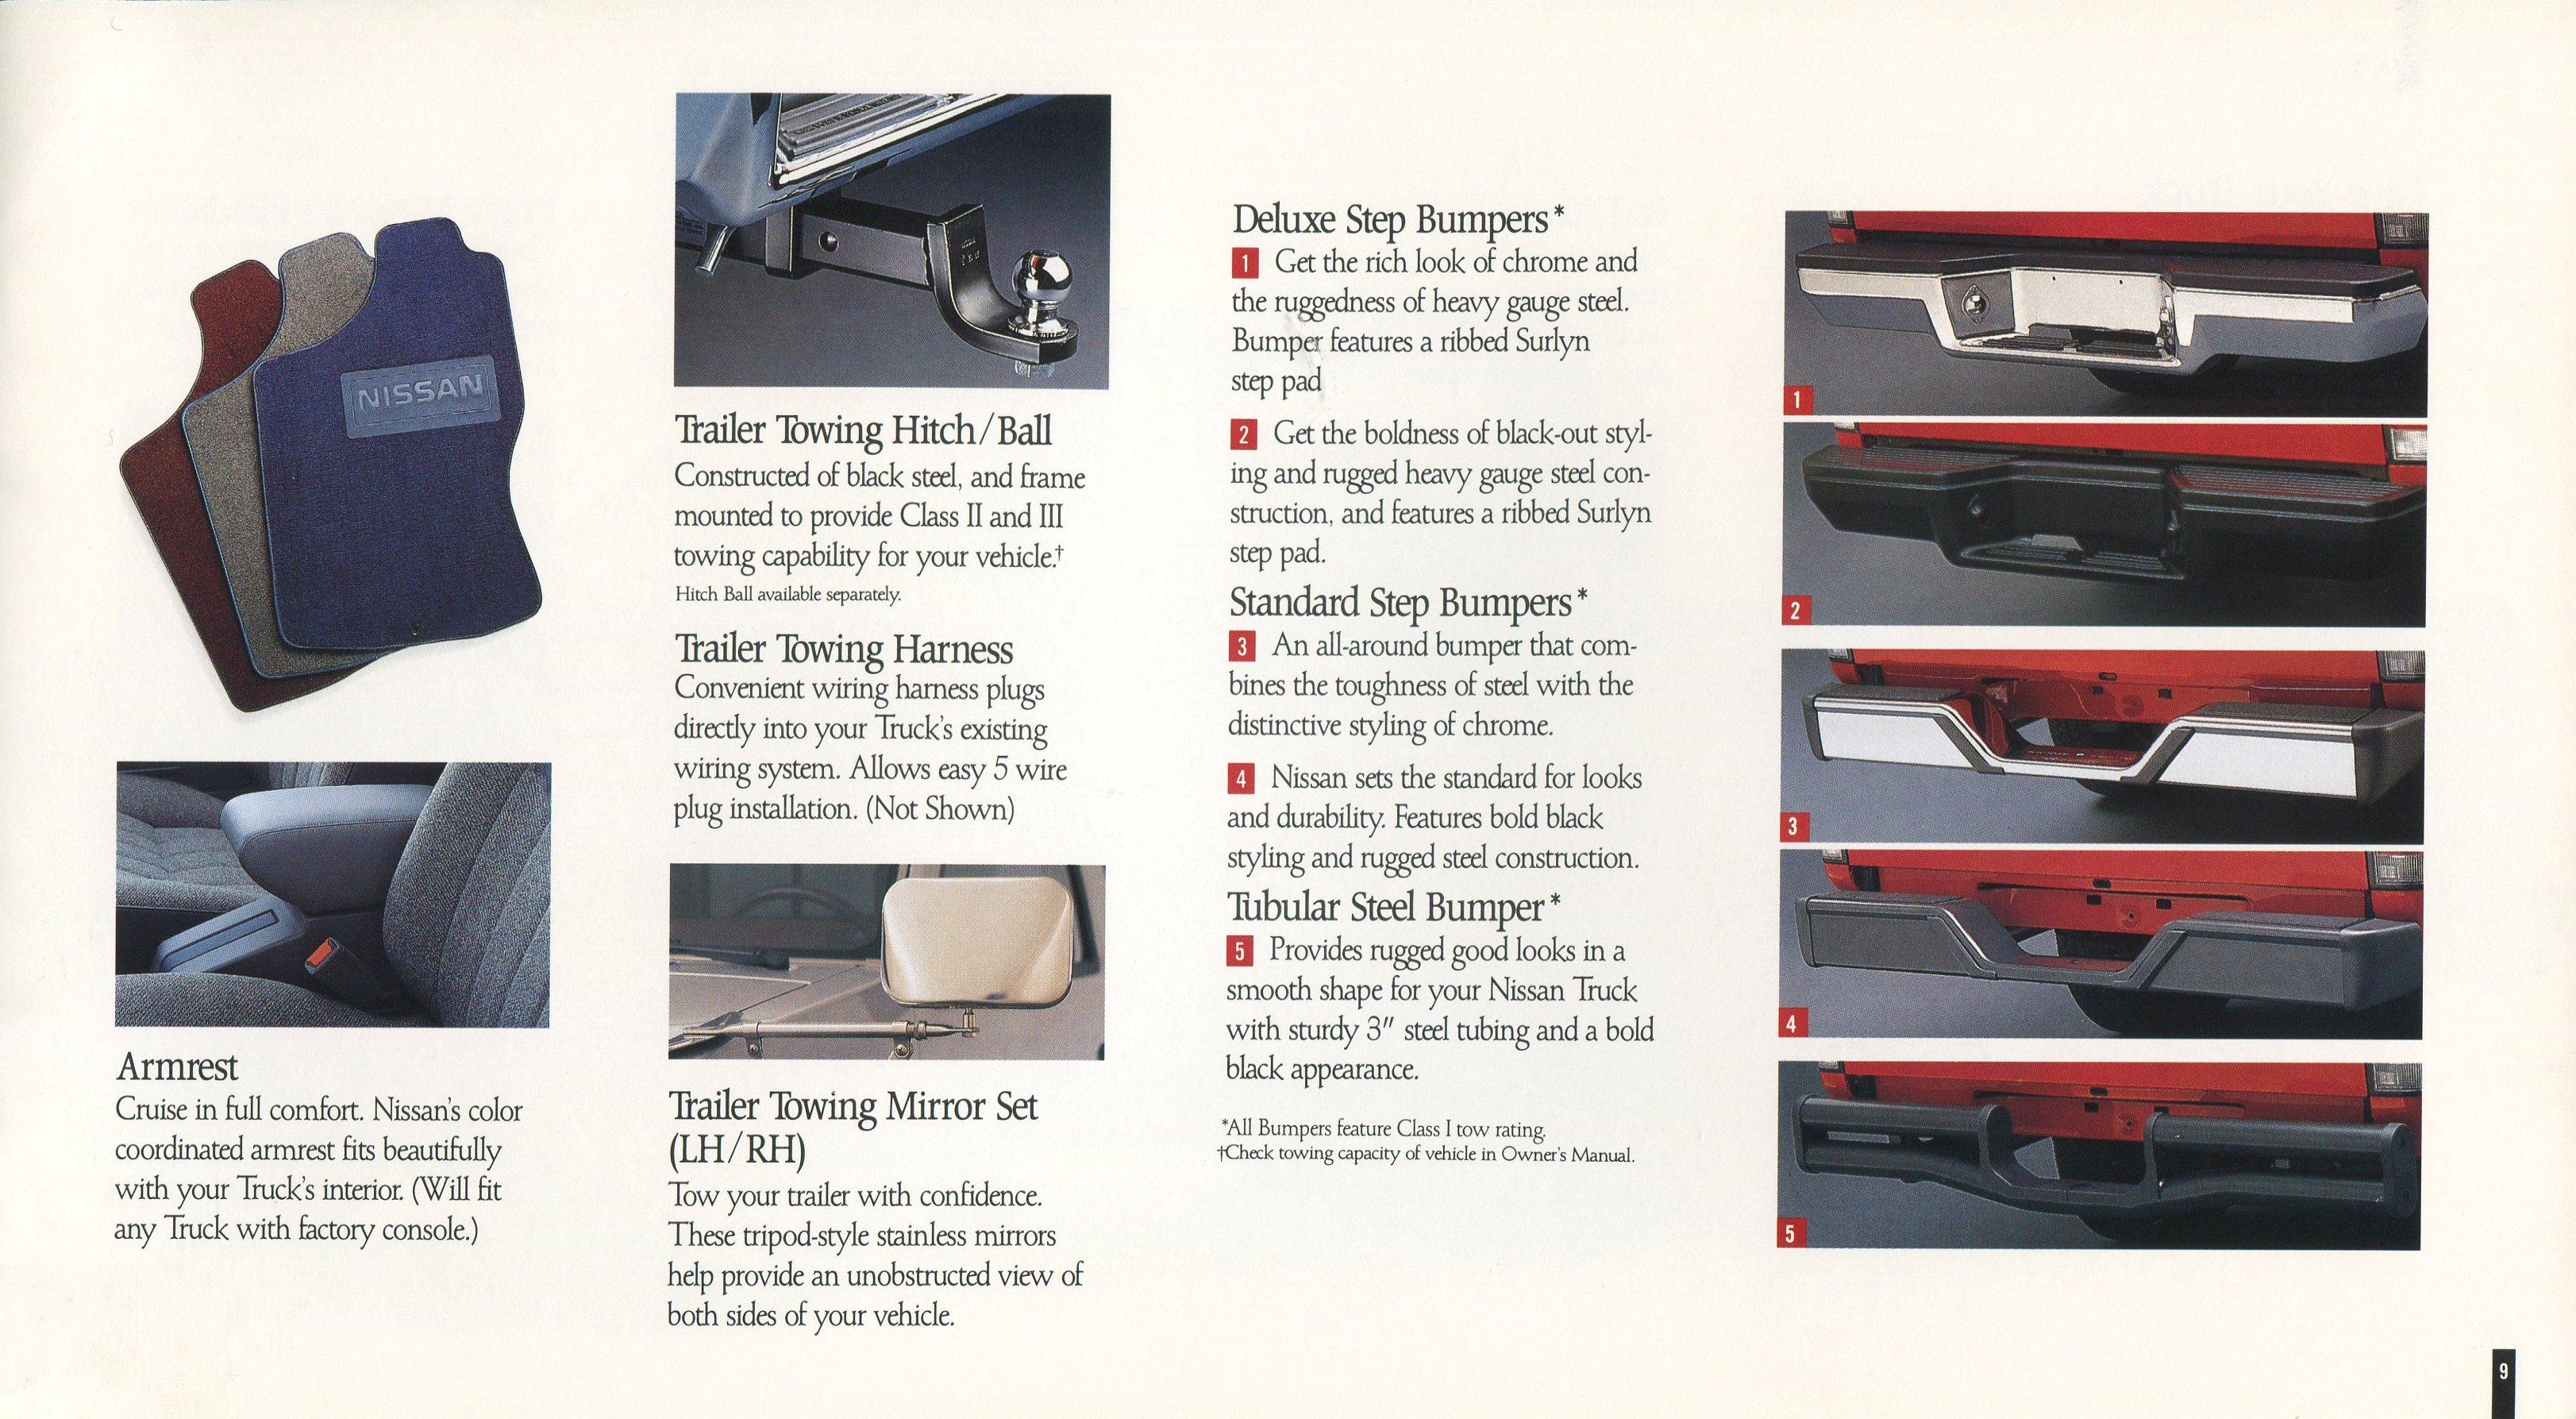 1991 Nissan Trucks Genuine Accessories Brochure Nicoclub Quest Wire Harness